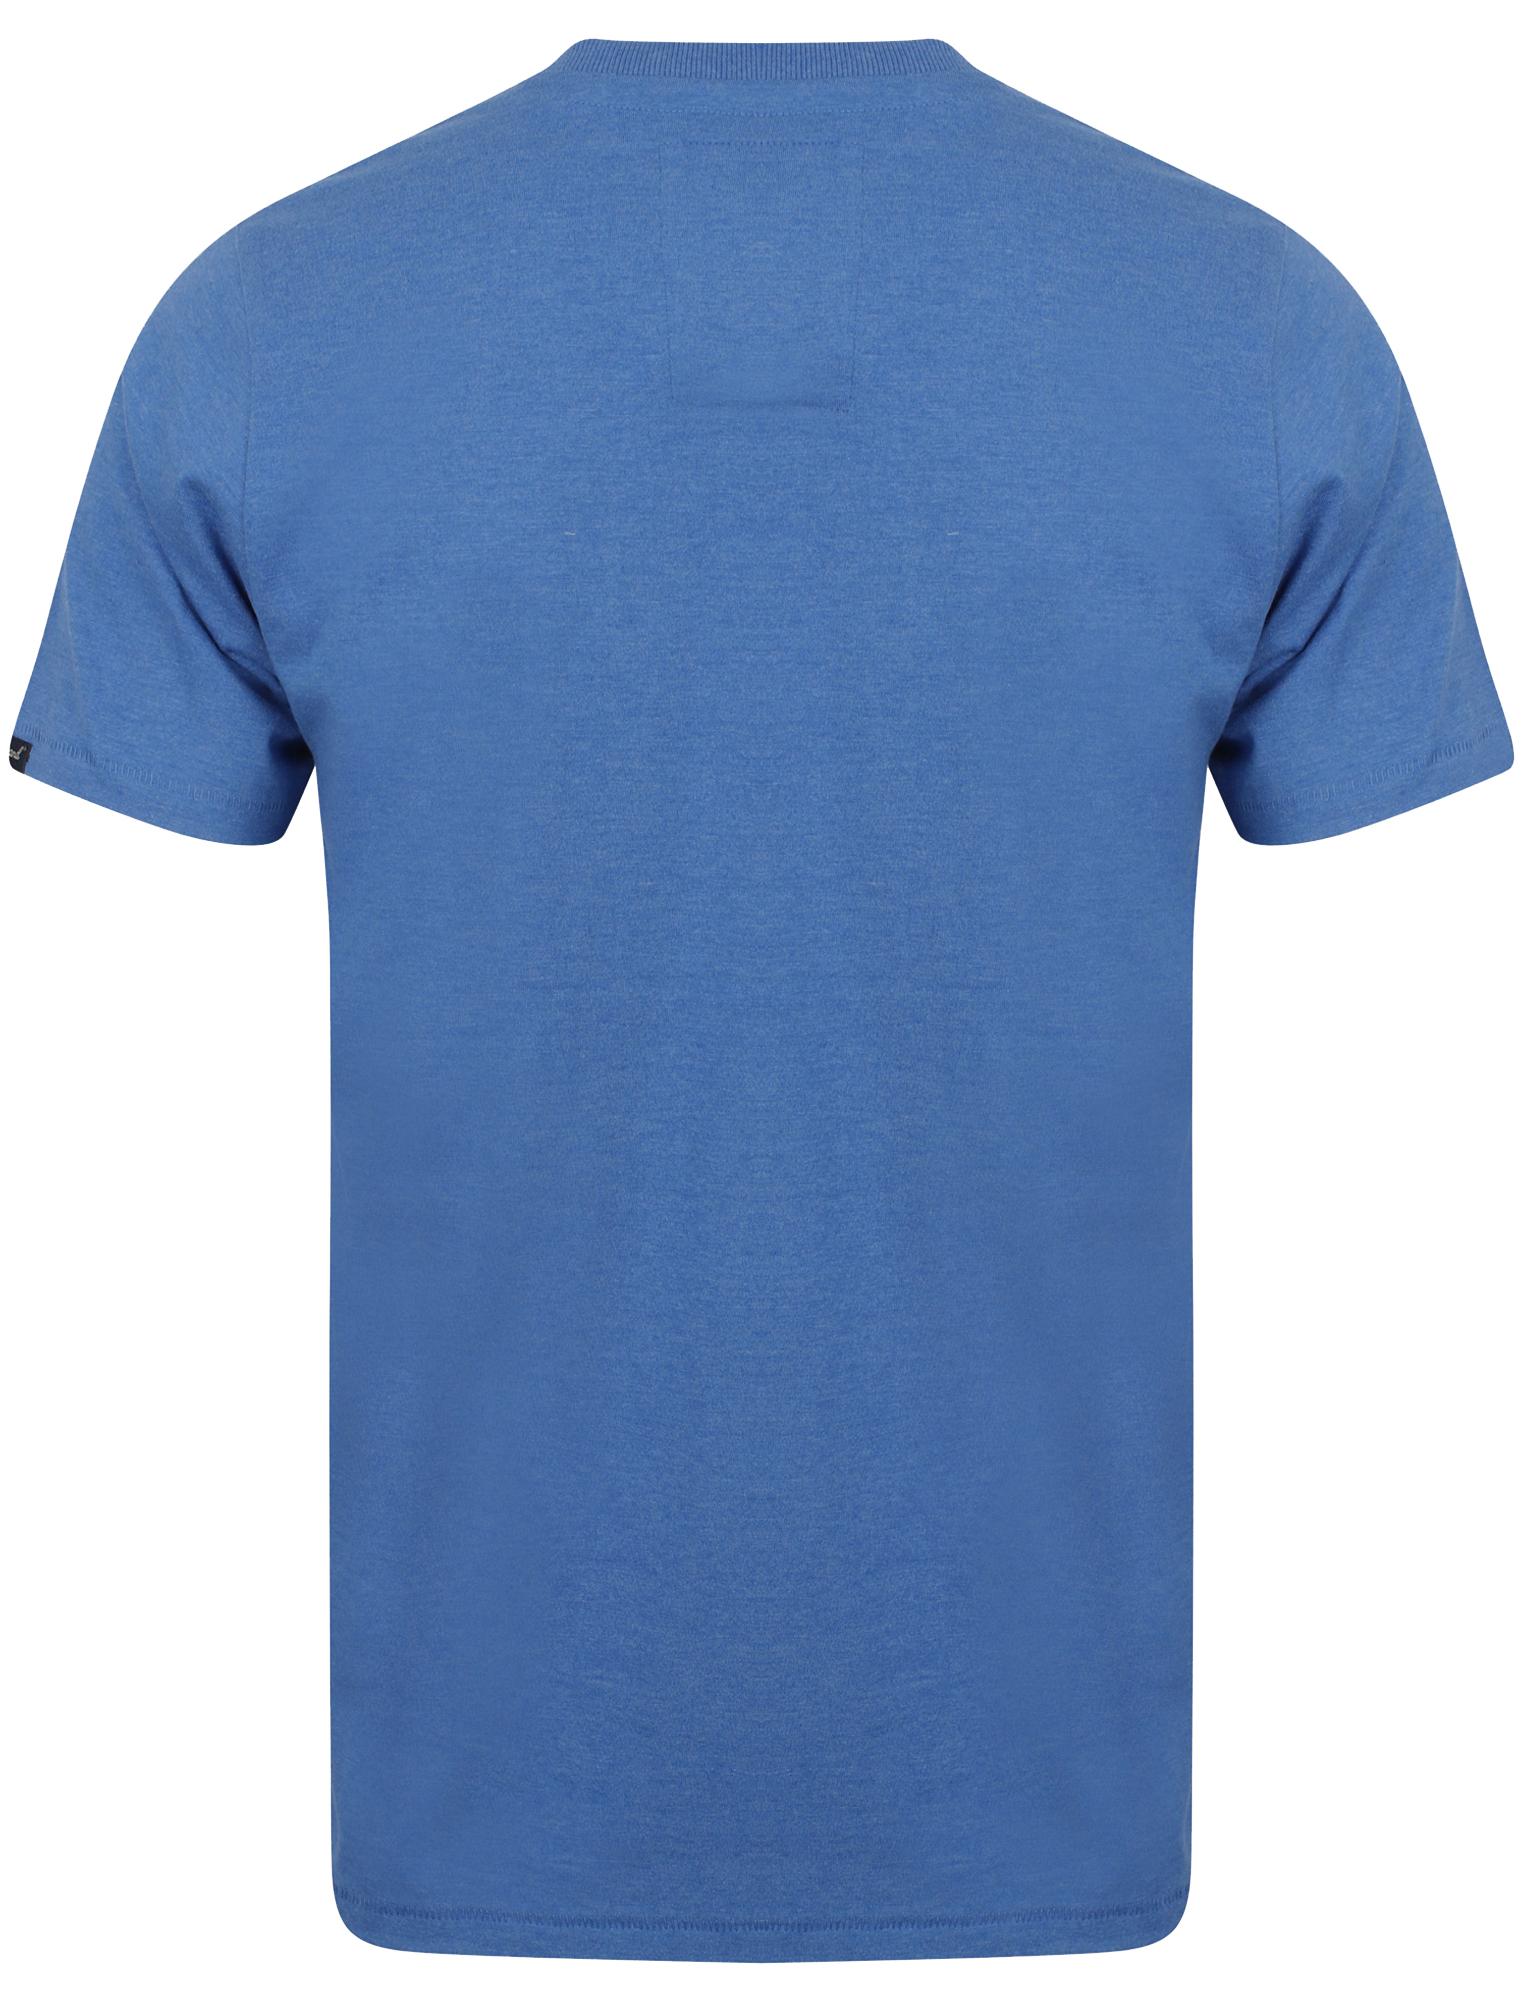 New-Mens-Tokyo-Laundry-Montecarlo-Crew-Neck-Cotton-Rich-Soft-T-Shirt-Size-S-XXL thumbnail 12